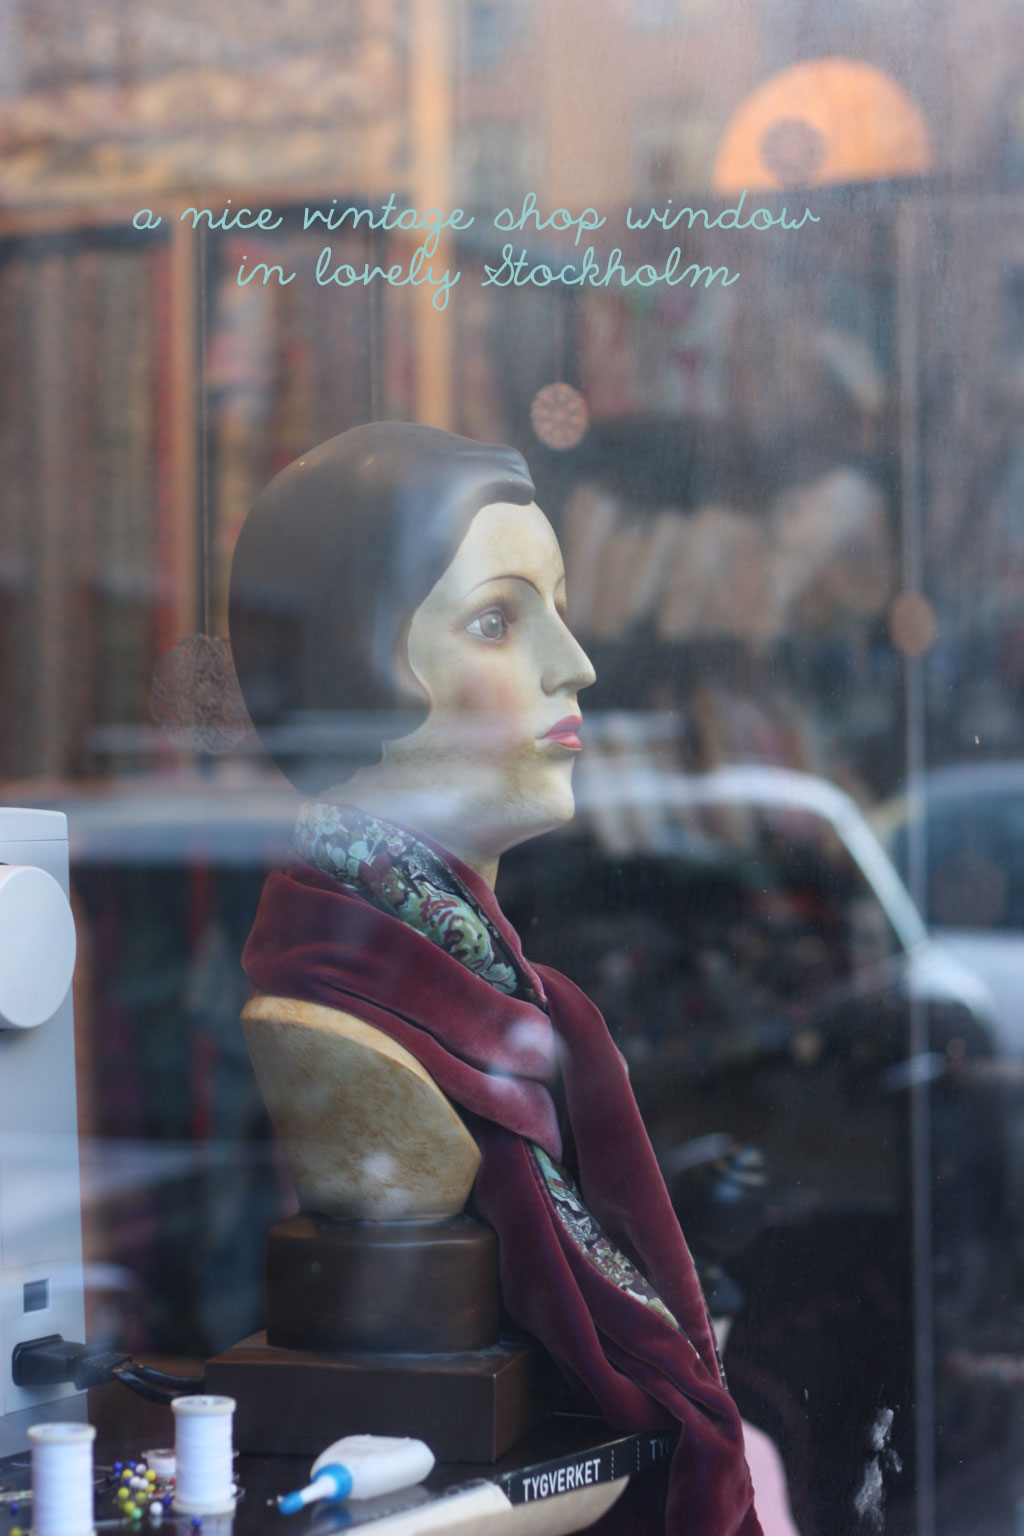 vintage-shop-window-in-stoc